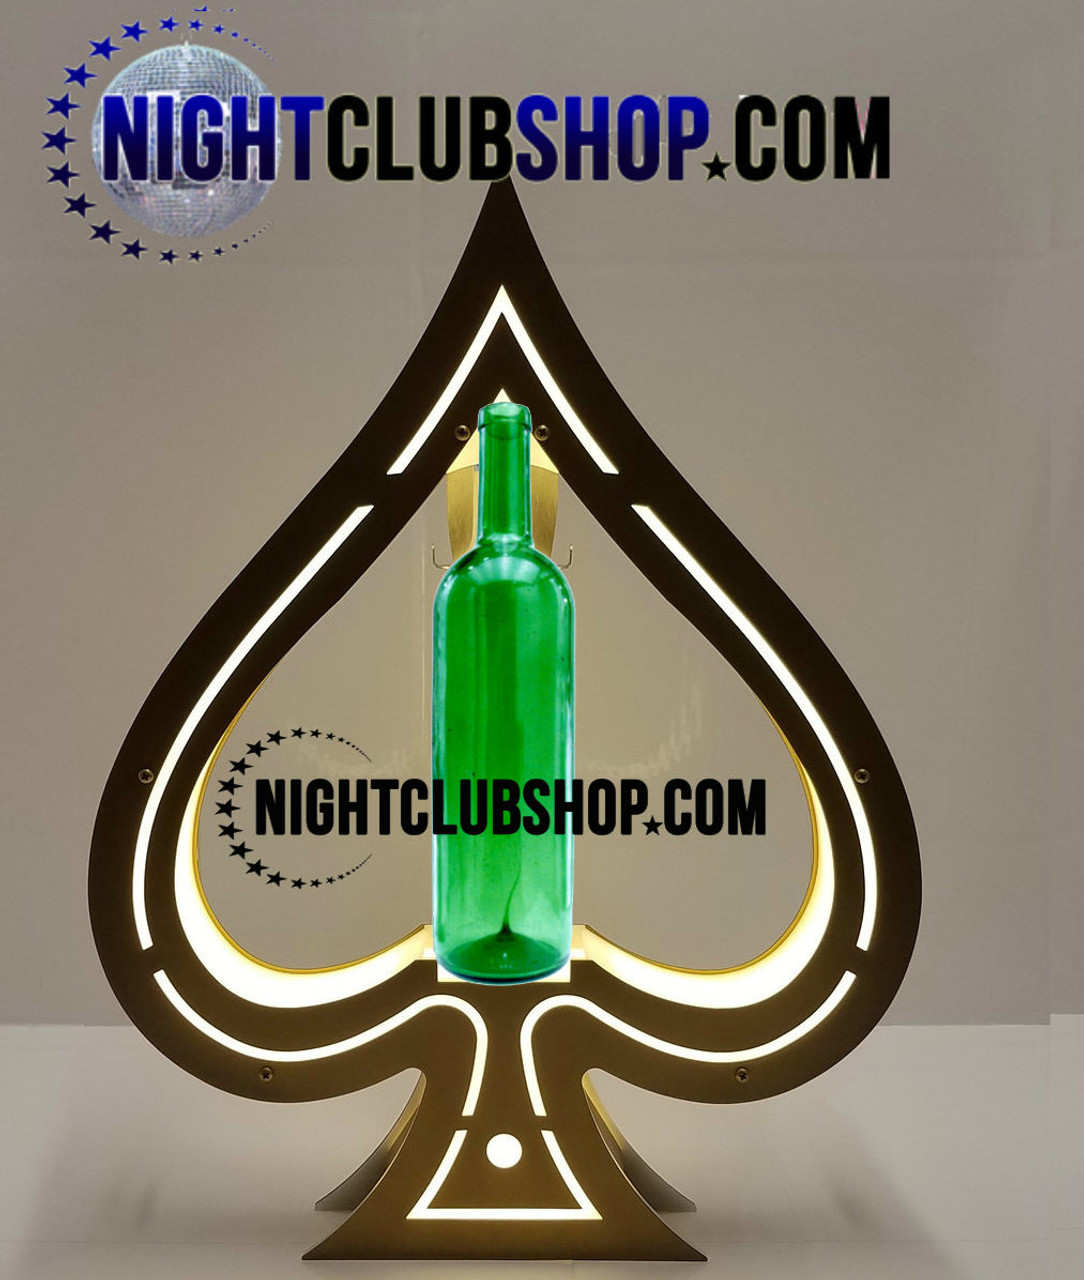 Spadilla, Ace,Spade,LED,Tray,Caddie,Presenter,Ace of Spades,Presentation, champagne, Liquor, carruer